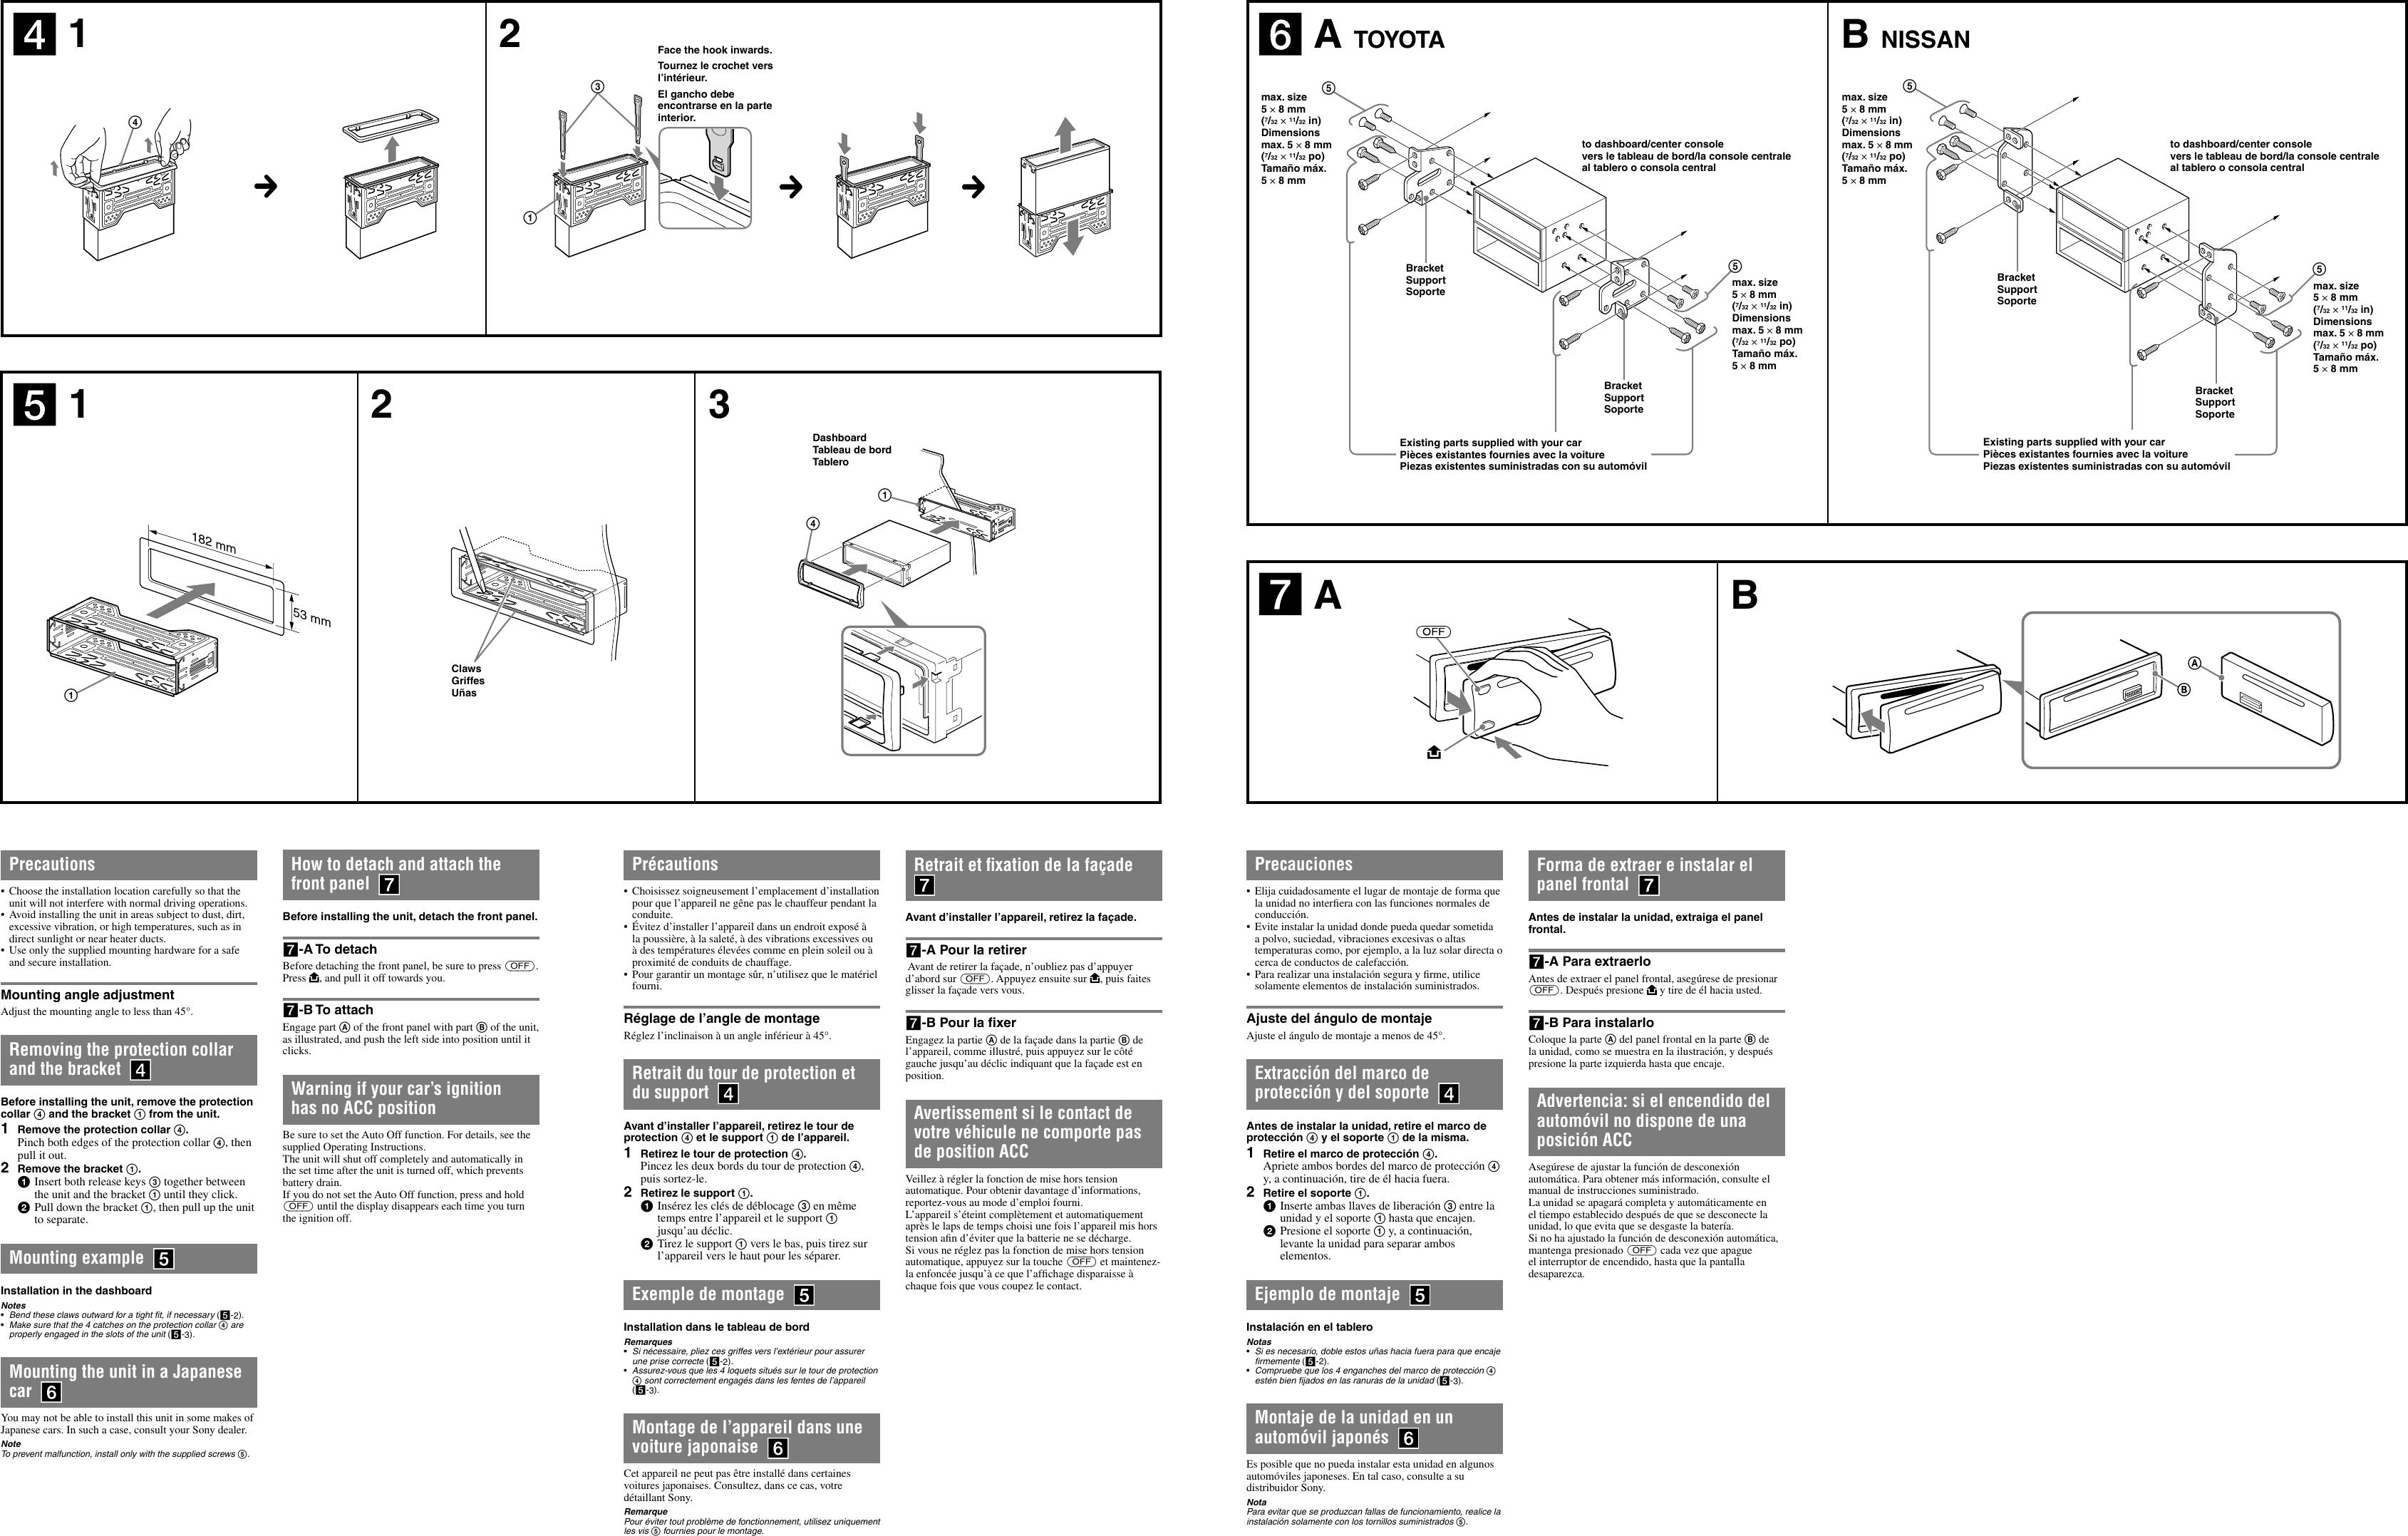 Page 2 of 2 - Sony Sony-Cdx-Gt23W-Installation-Connections-Manual- CDX-GT23W  Sony-cdx-gt23w-installation-connections-manual